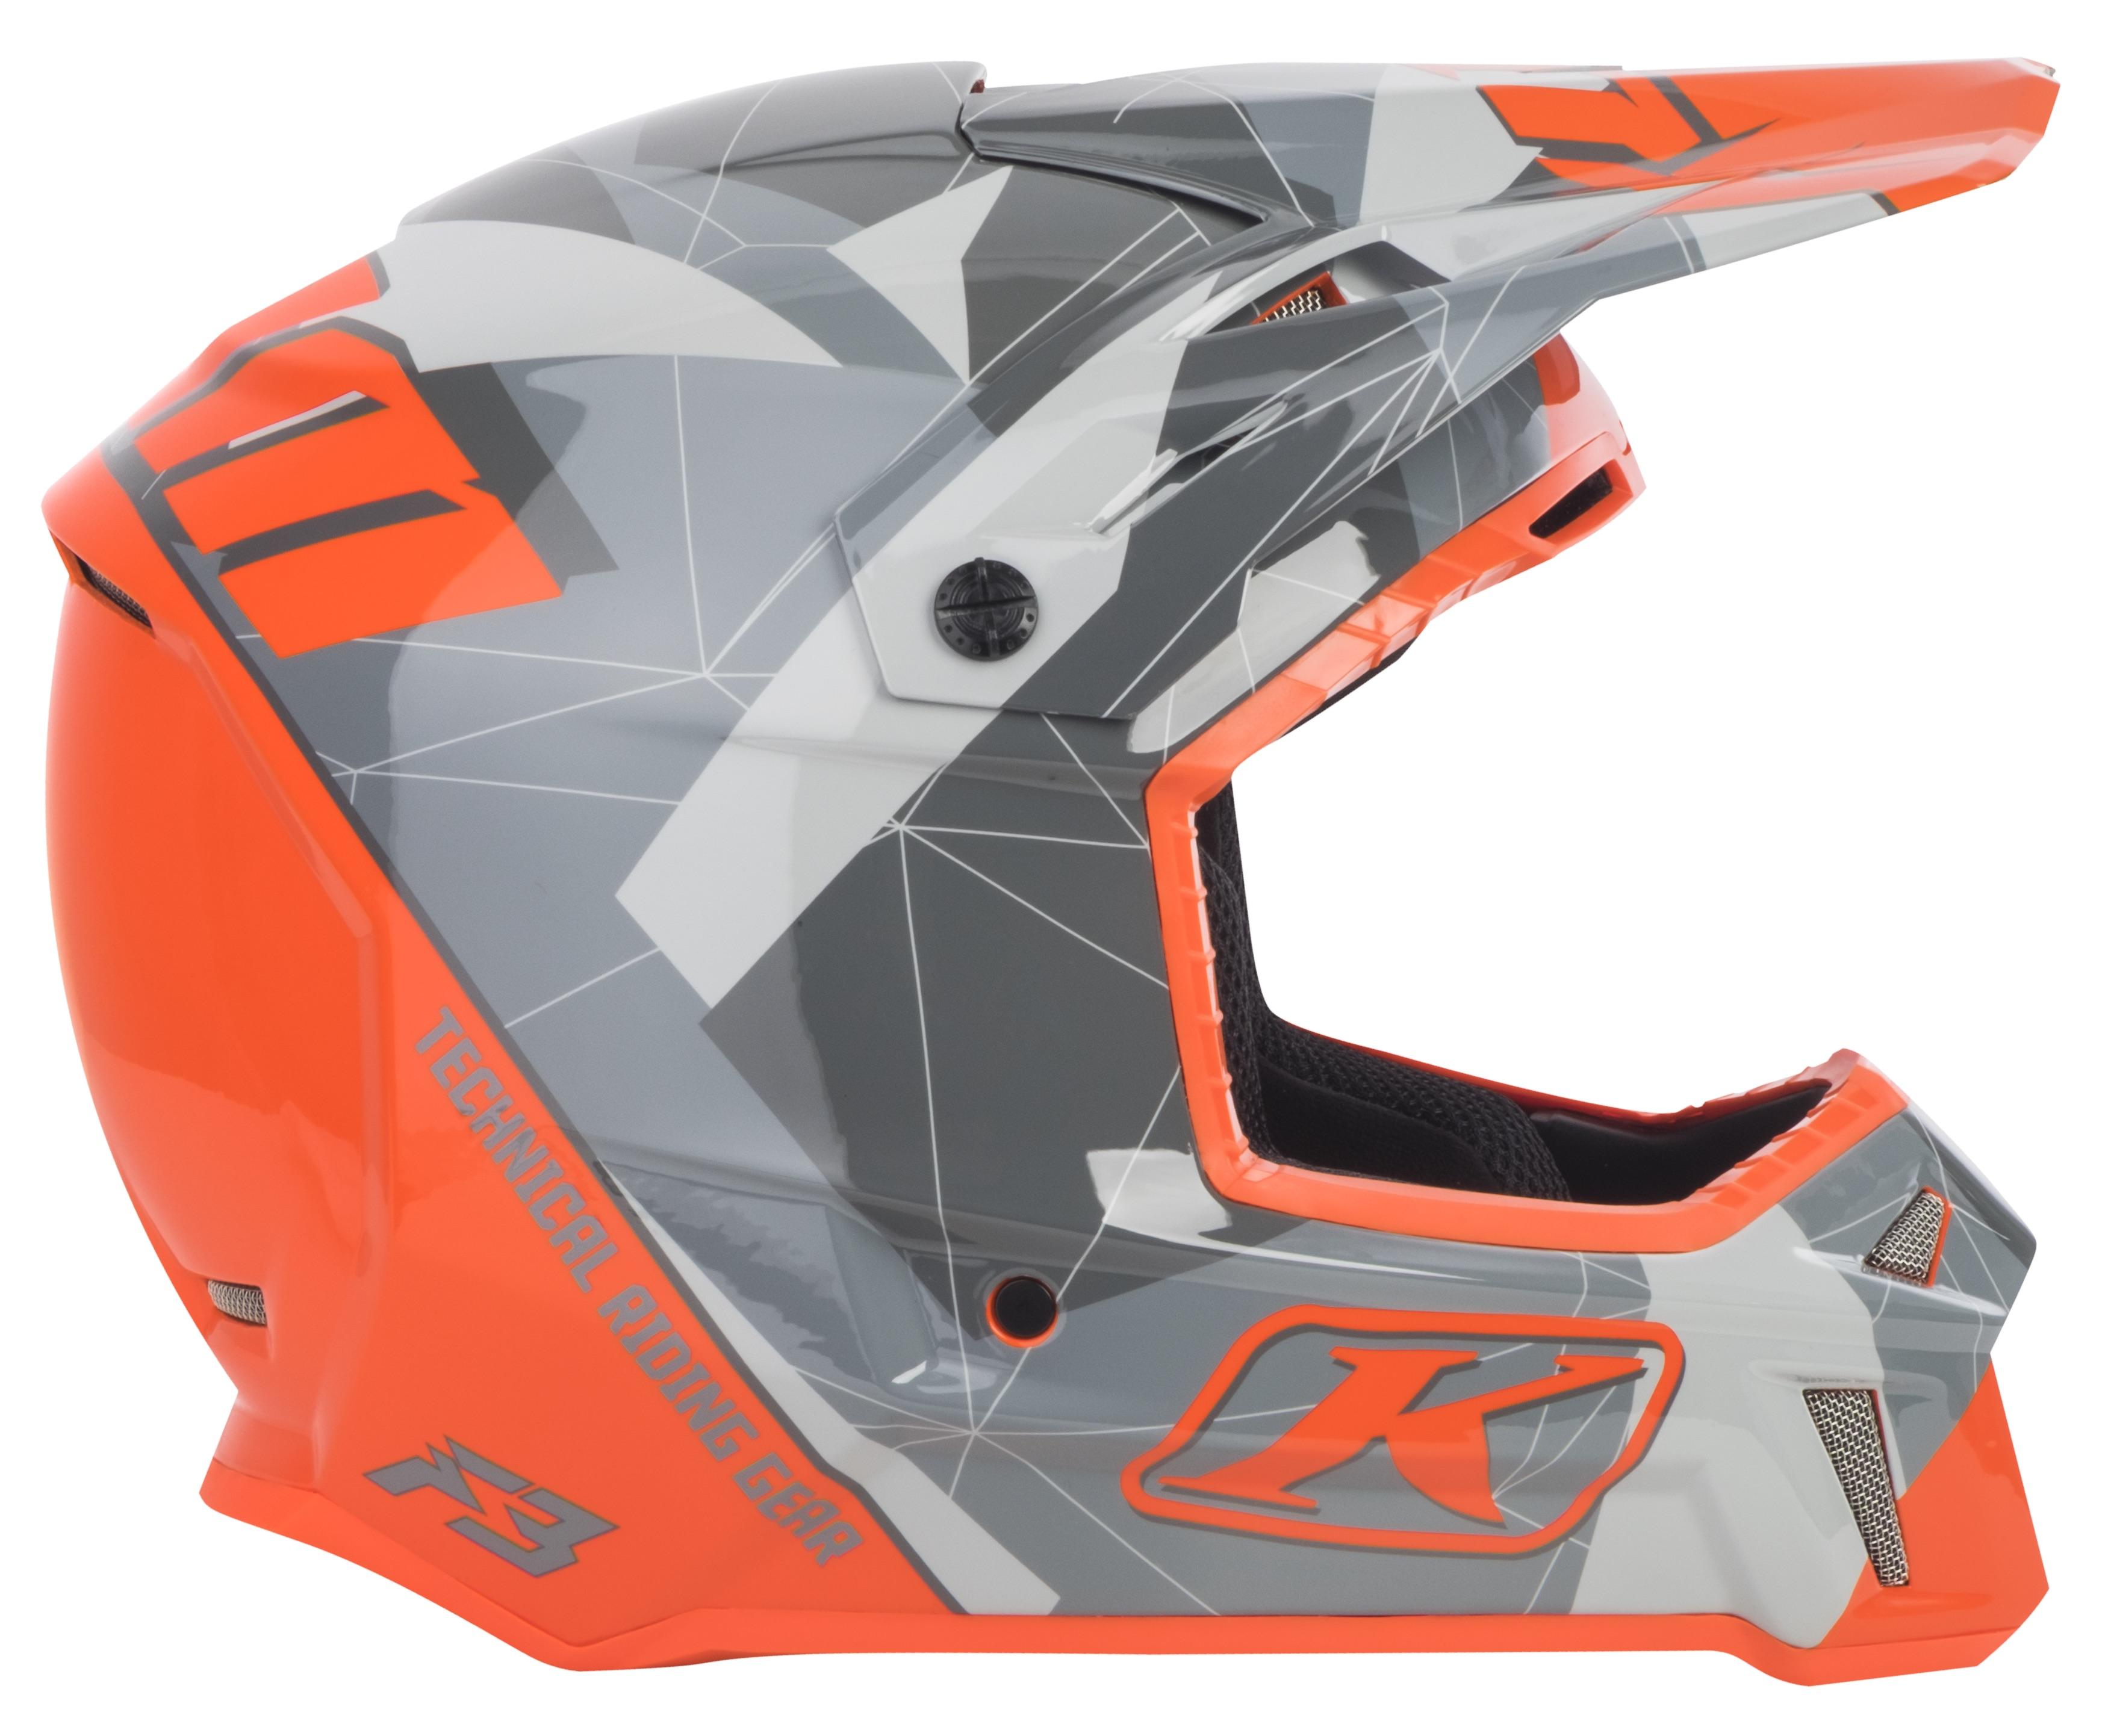 f3-helmet-3110-000_gray-camo_01